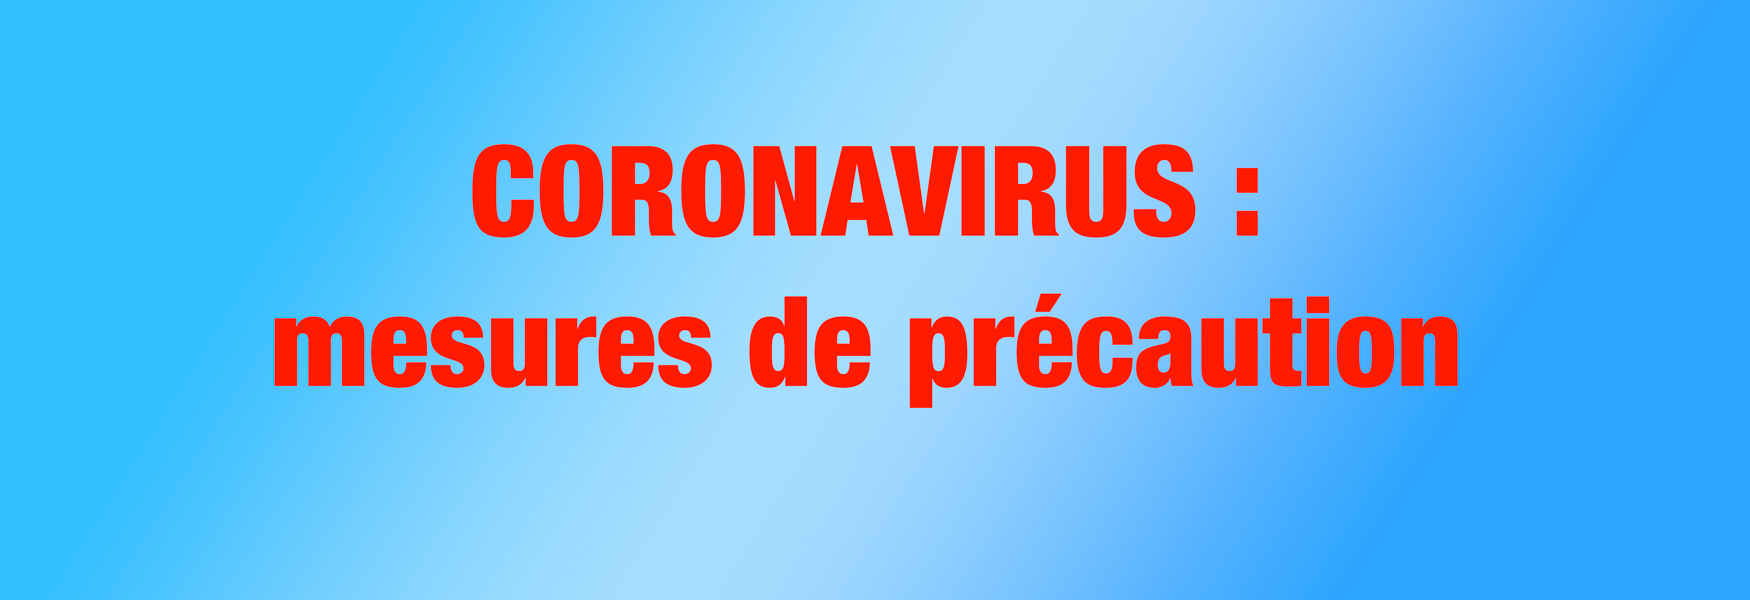 CORONAVIRUS : mesures de précaution